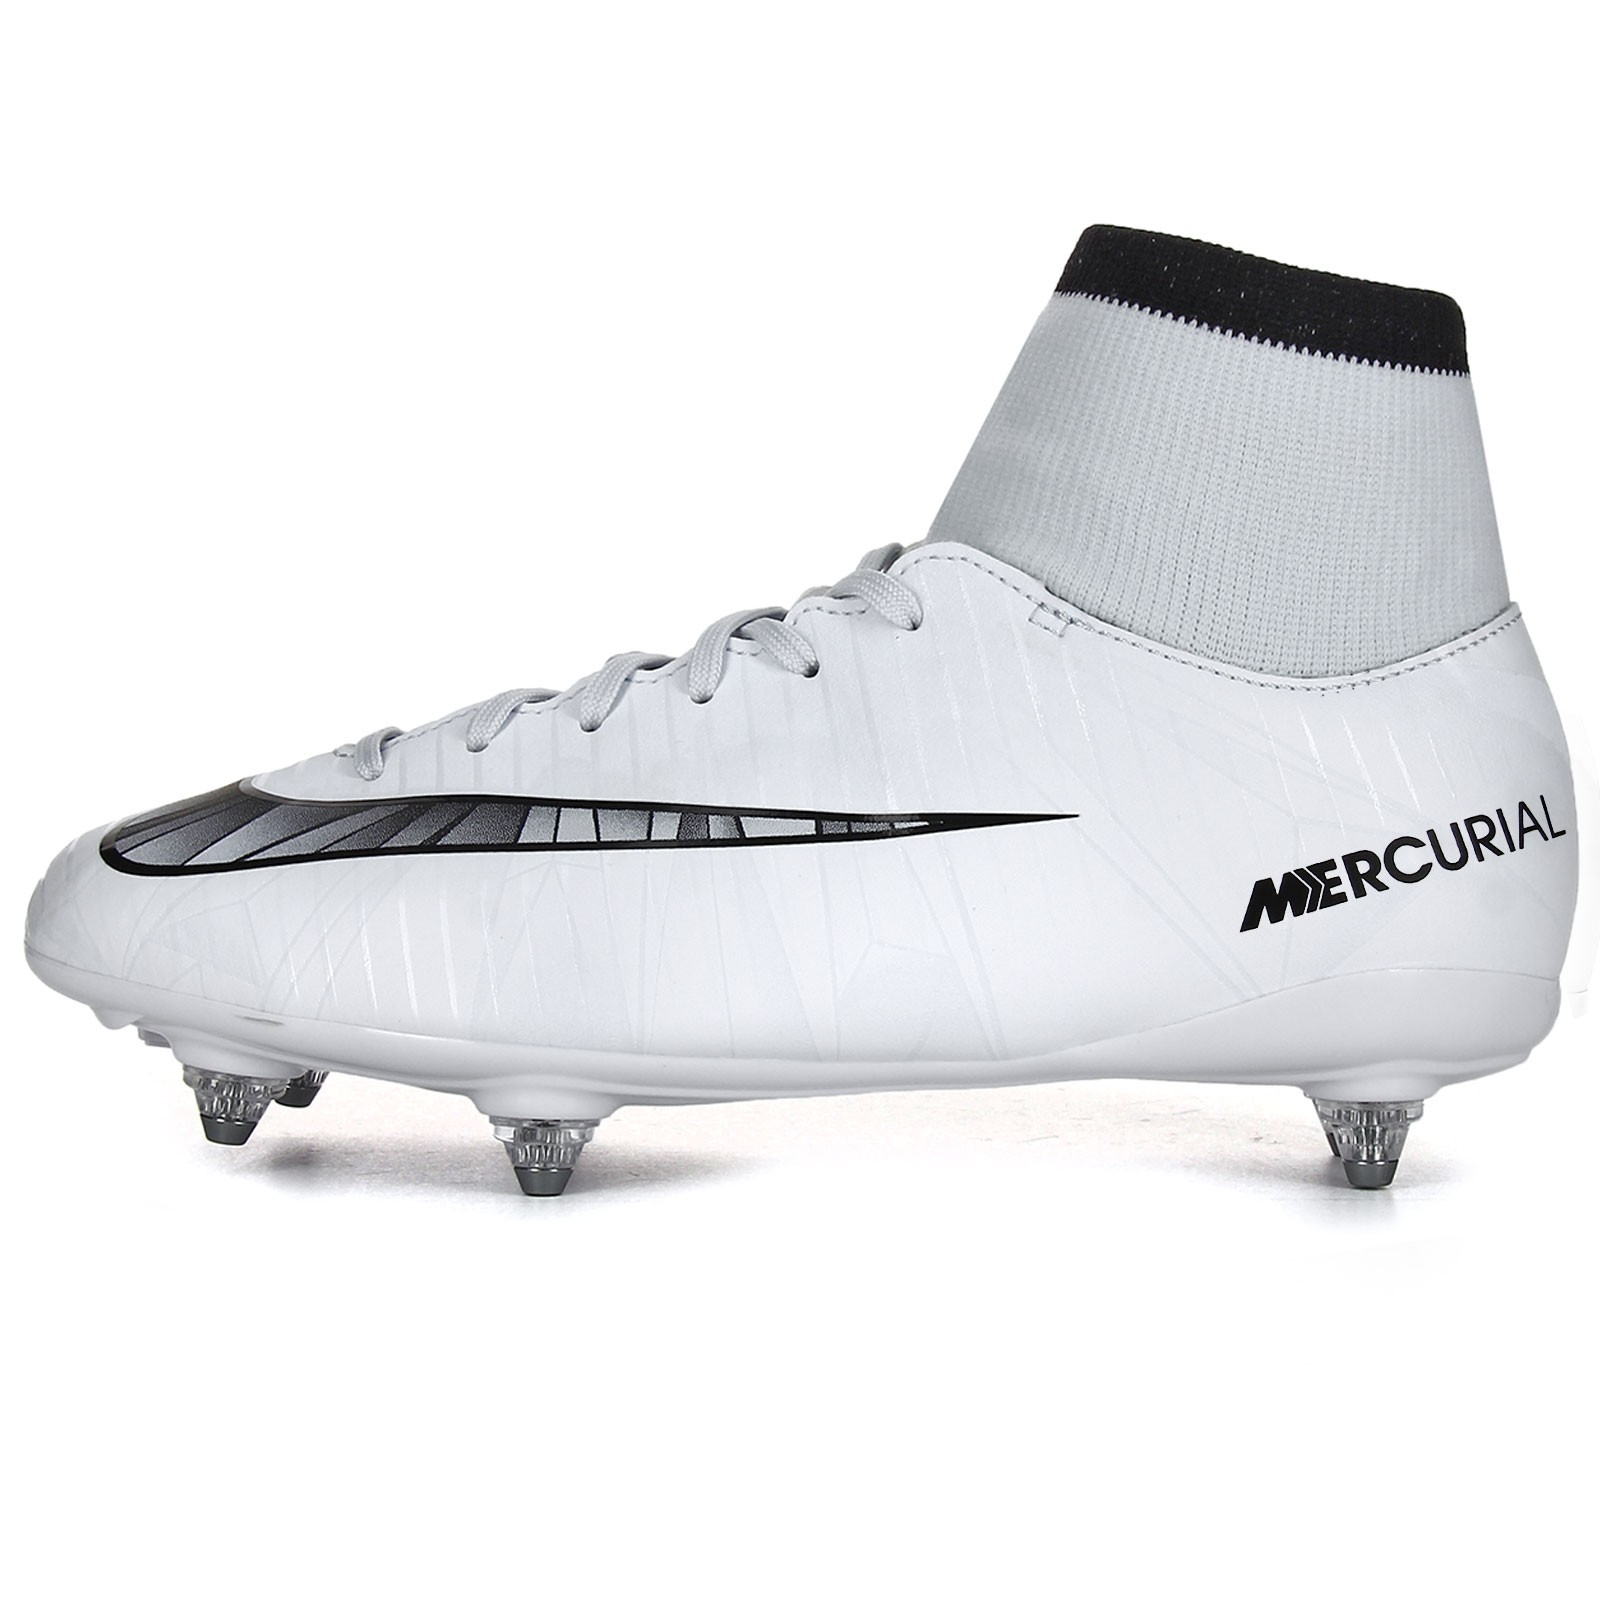 online store 64560 87e51 Mercurial Victory VI Ronaldo DF SG Football Boots